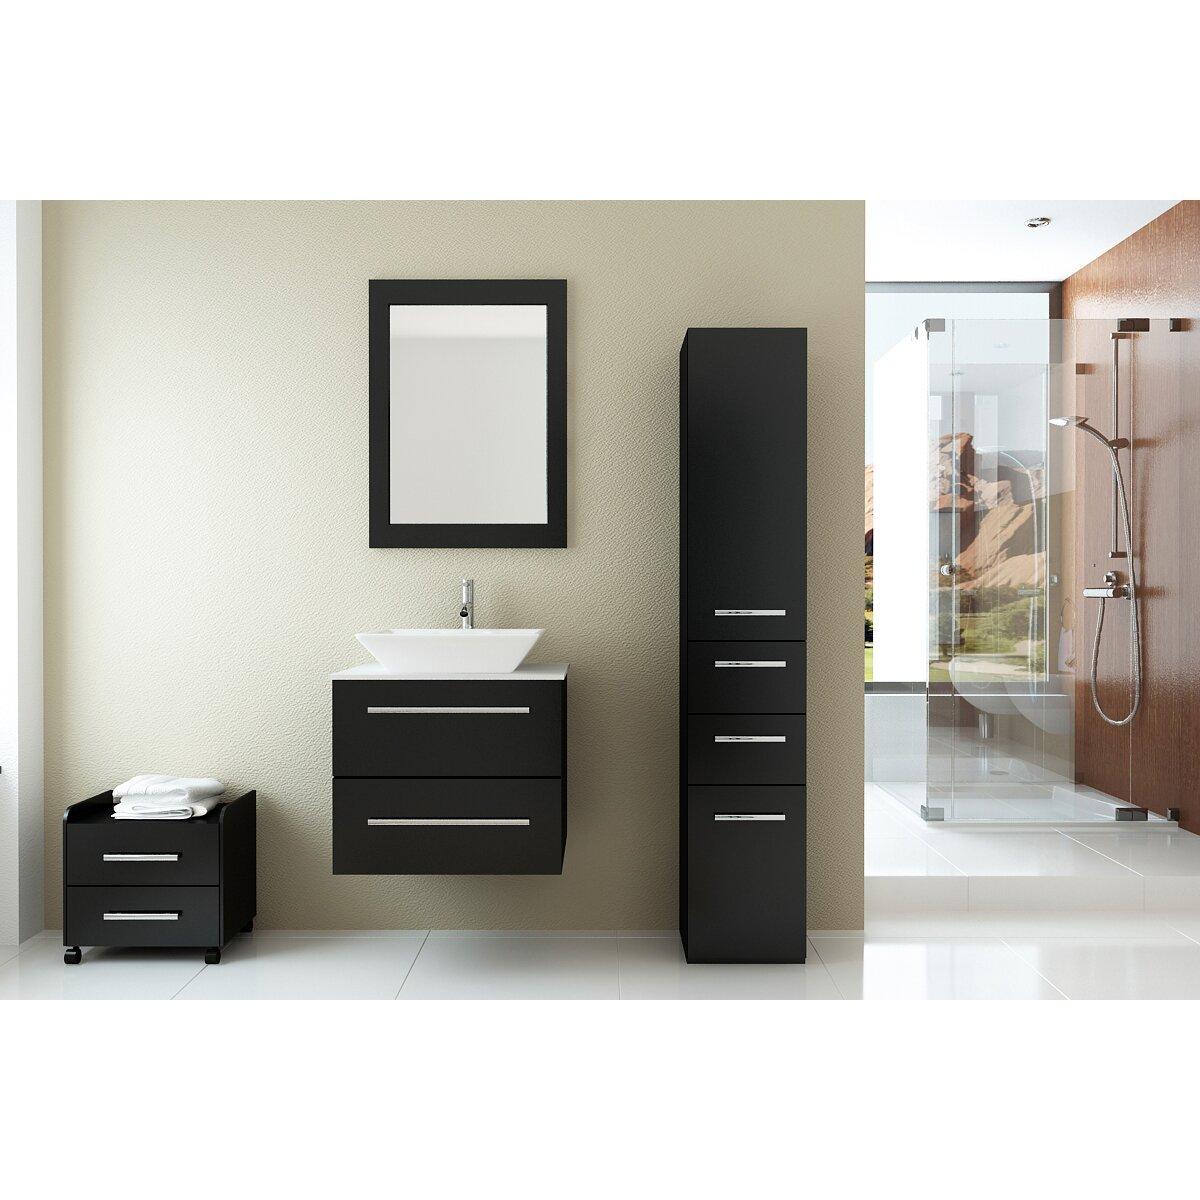 "jwh living carina "" single wall mounted bathroom vanity set, Bathroom decor"